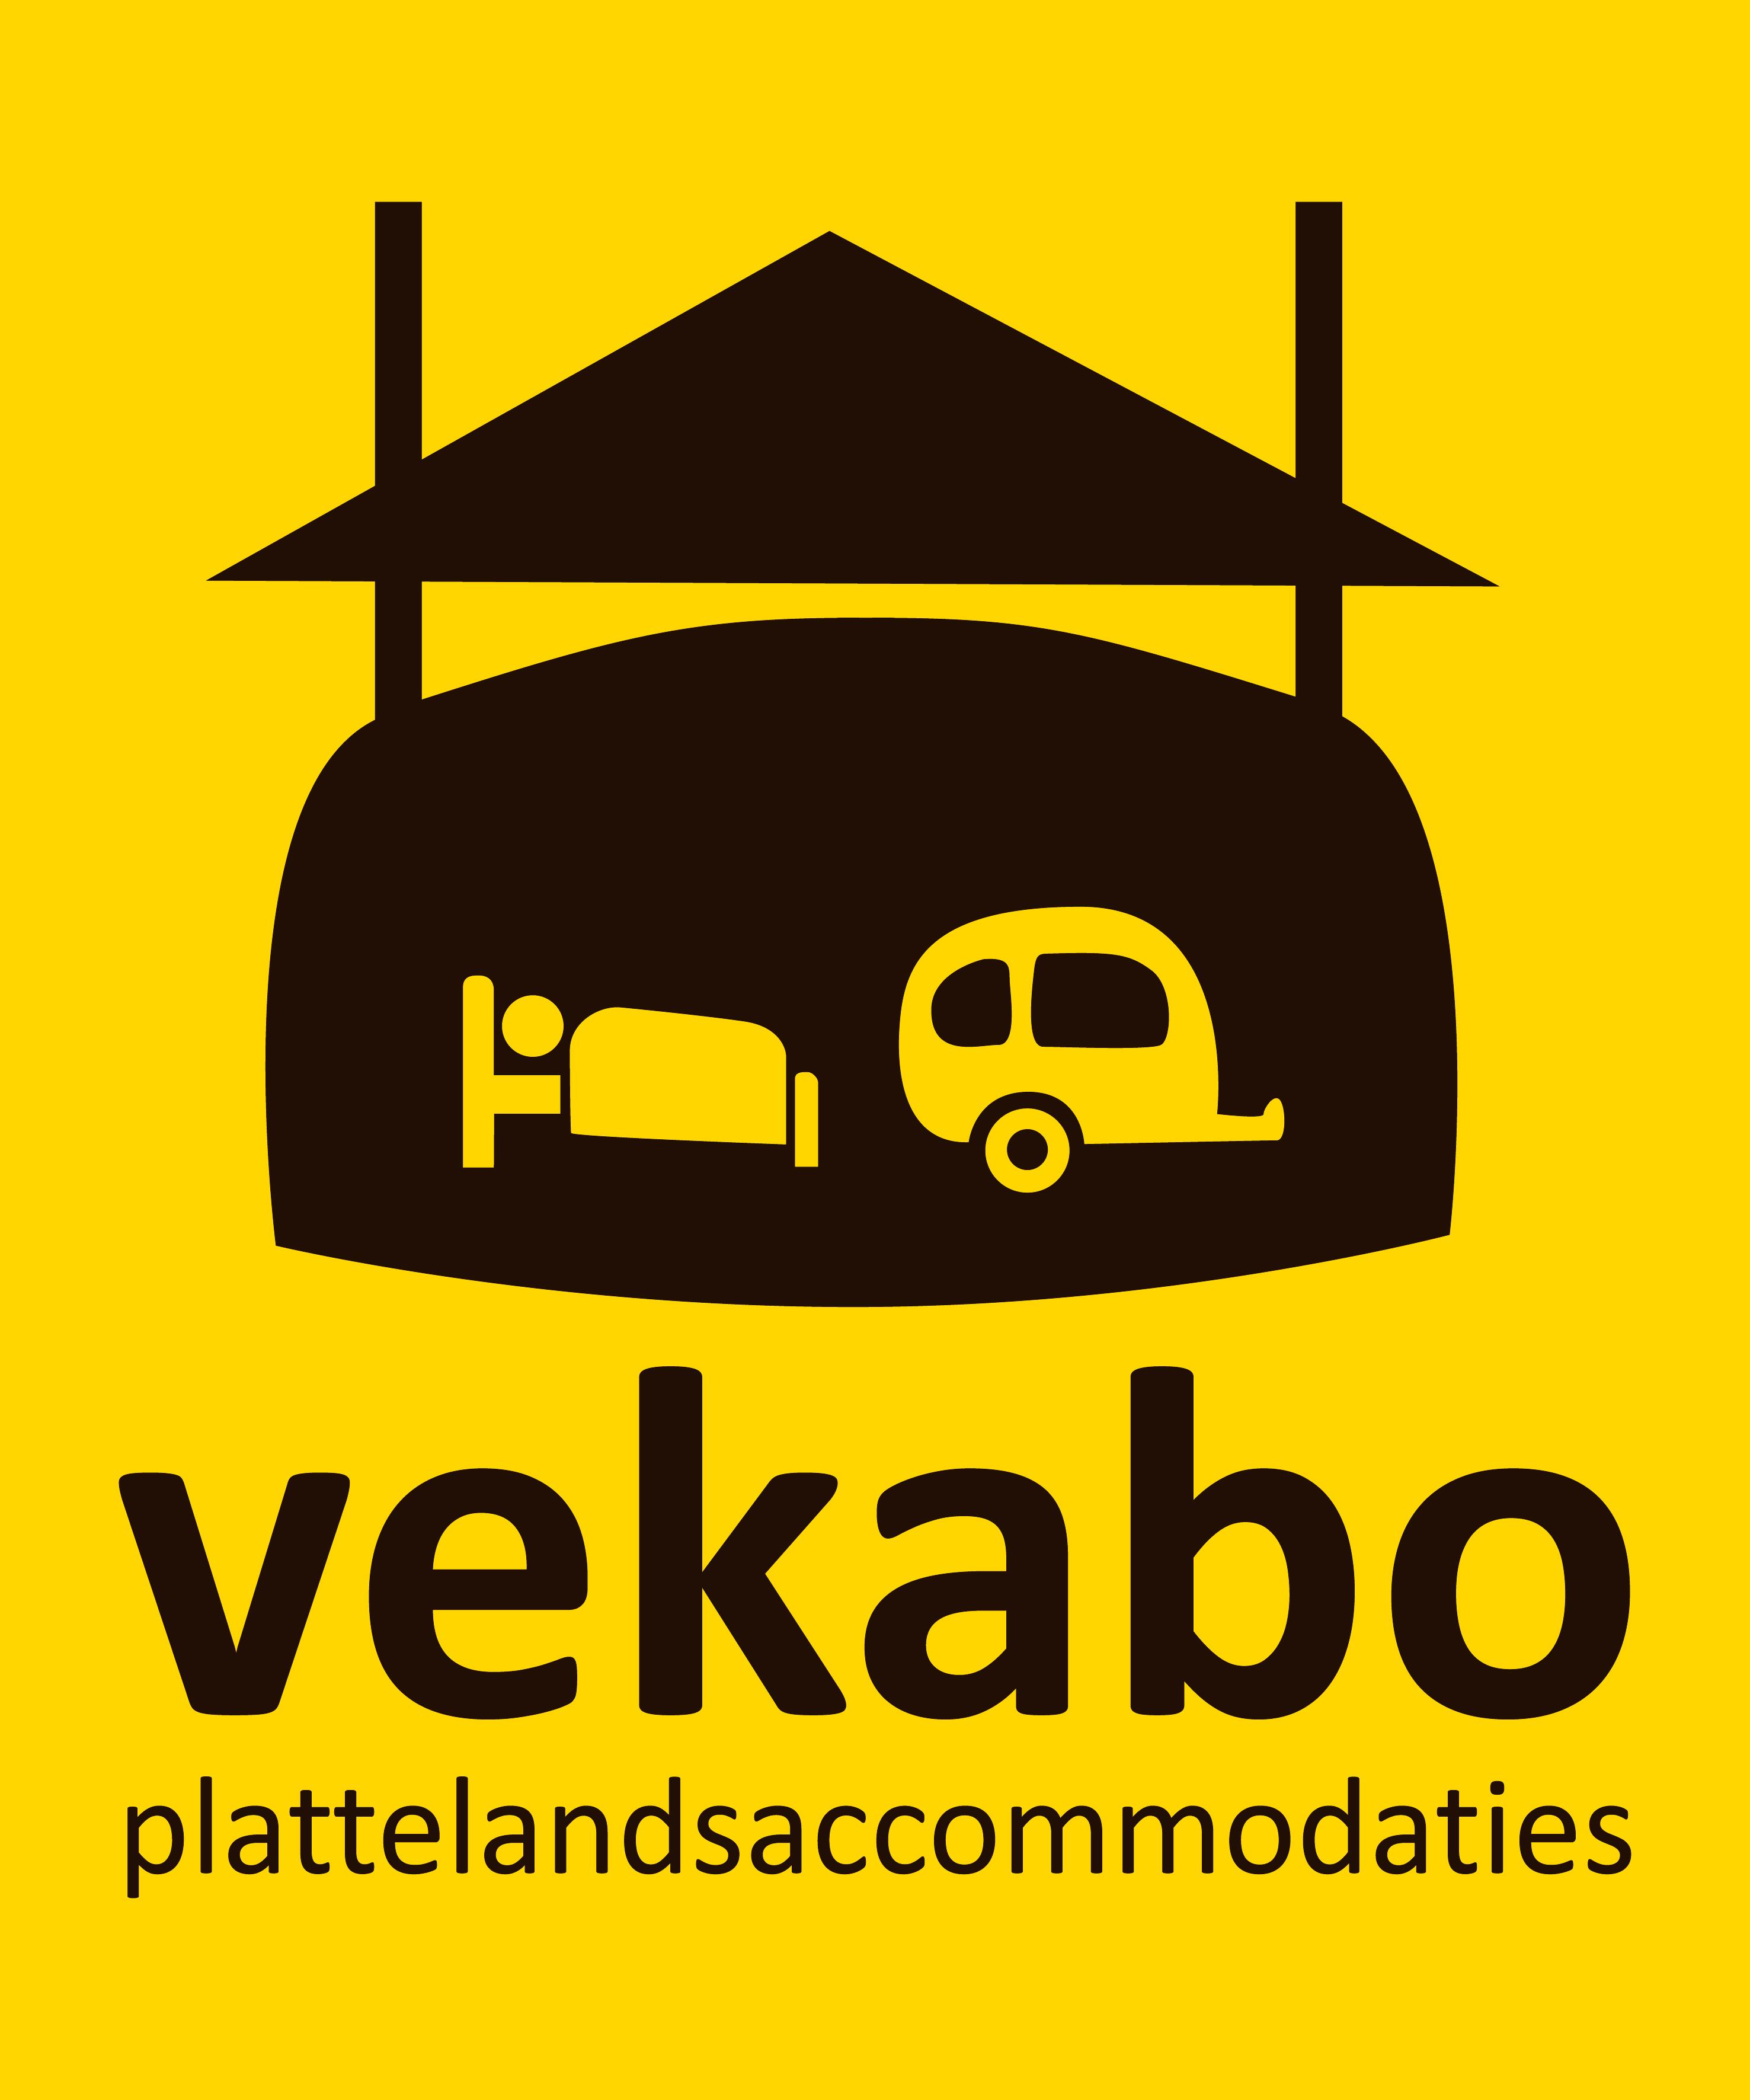 Vekabo logo